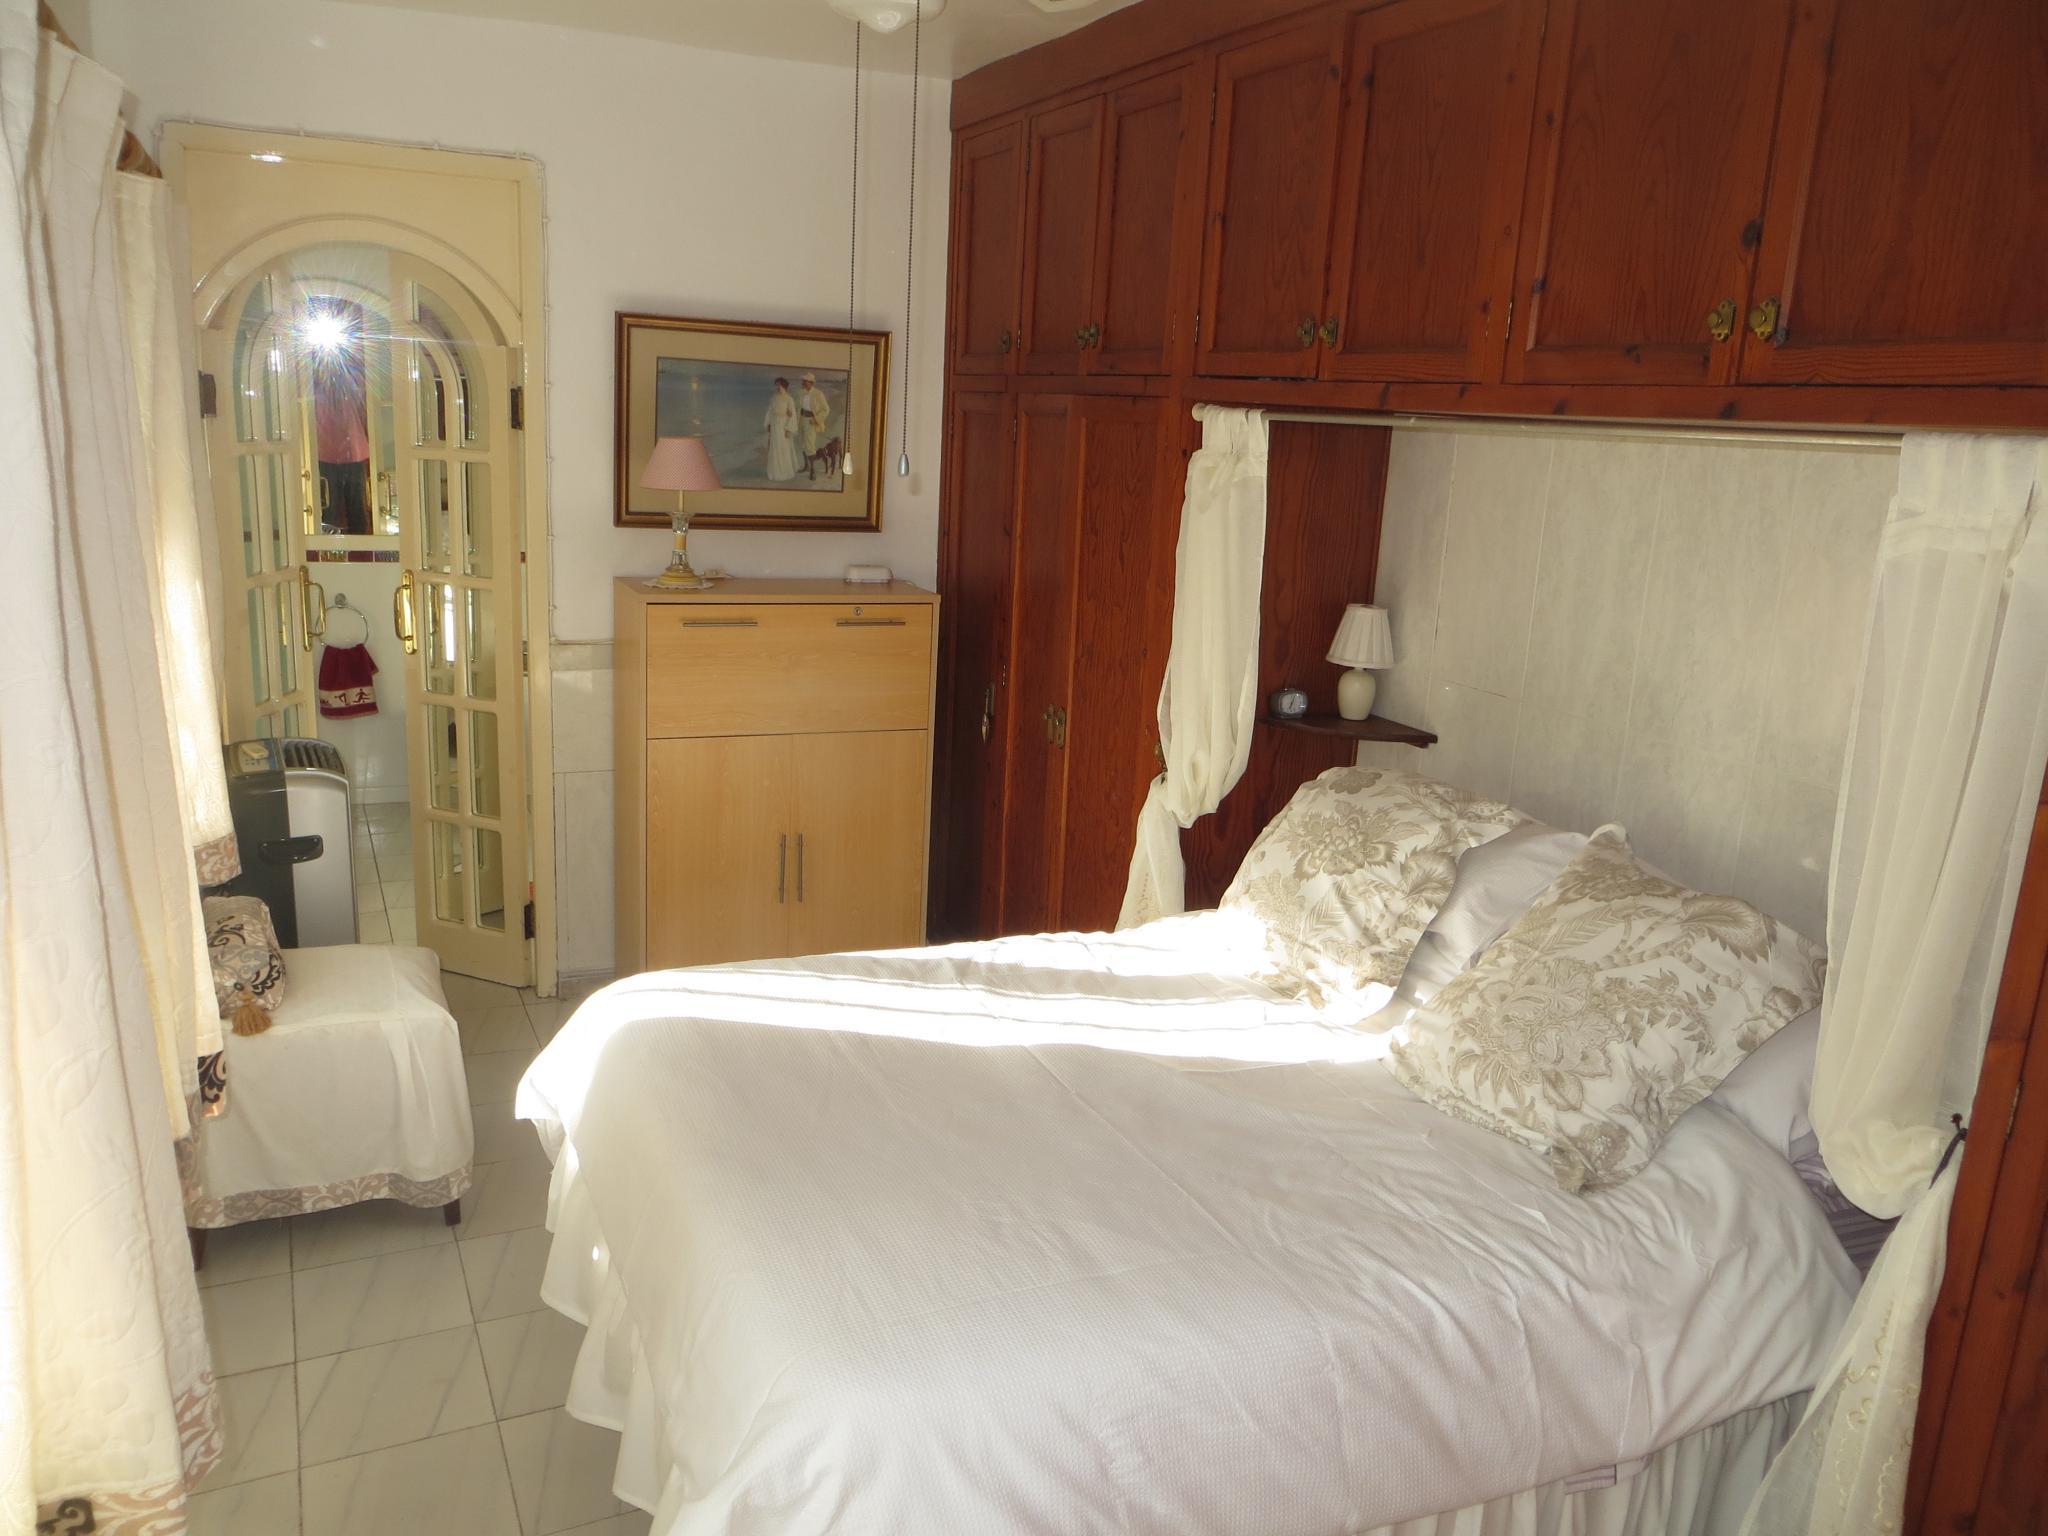 5 Bedroom Detached Villa House For Sale - Photograph 6